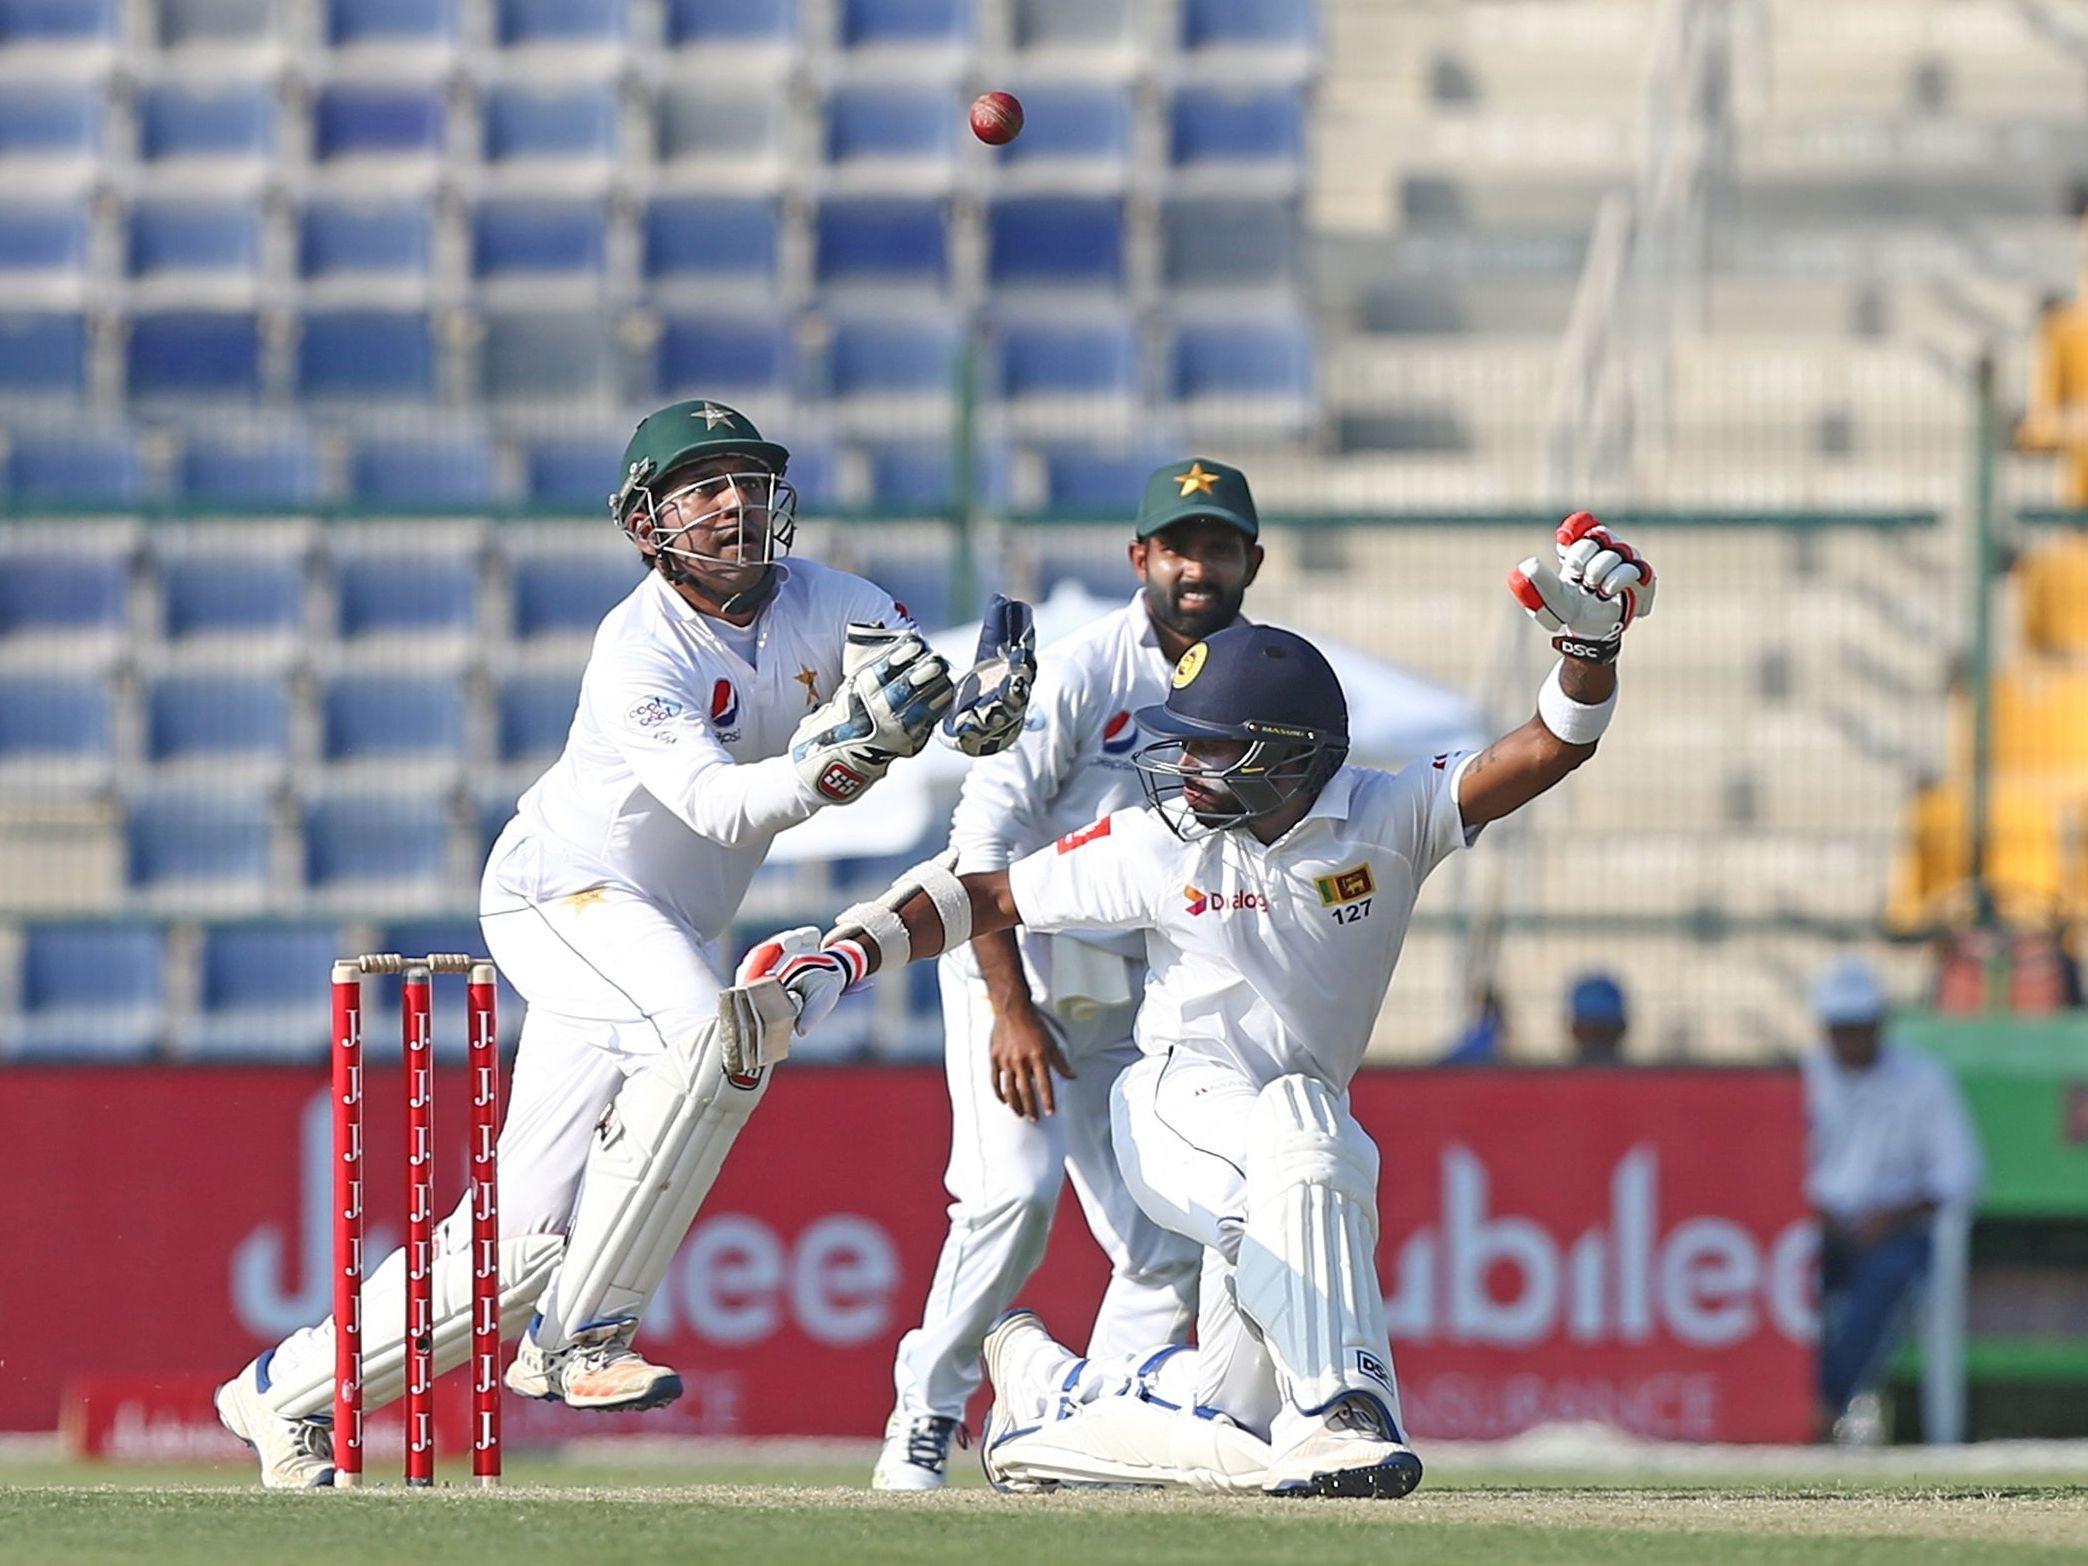 Rawalpindi, Karachi to host test matches against Sri Lanka